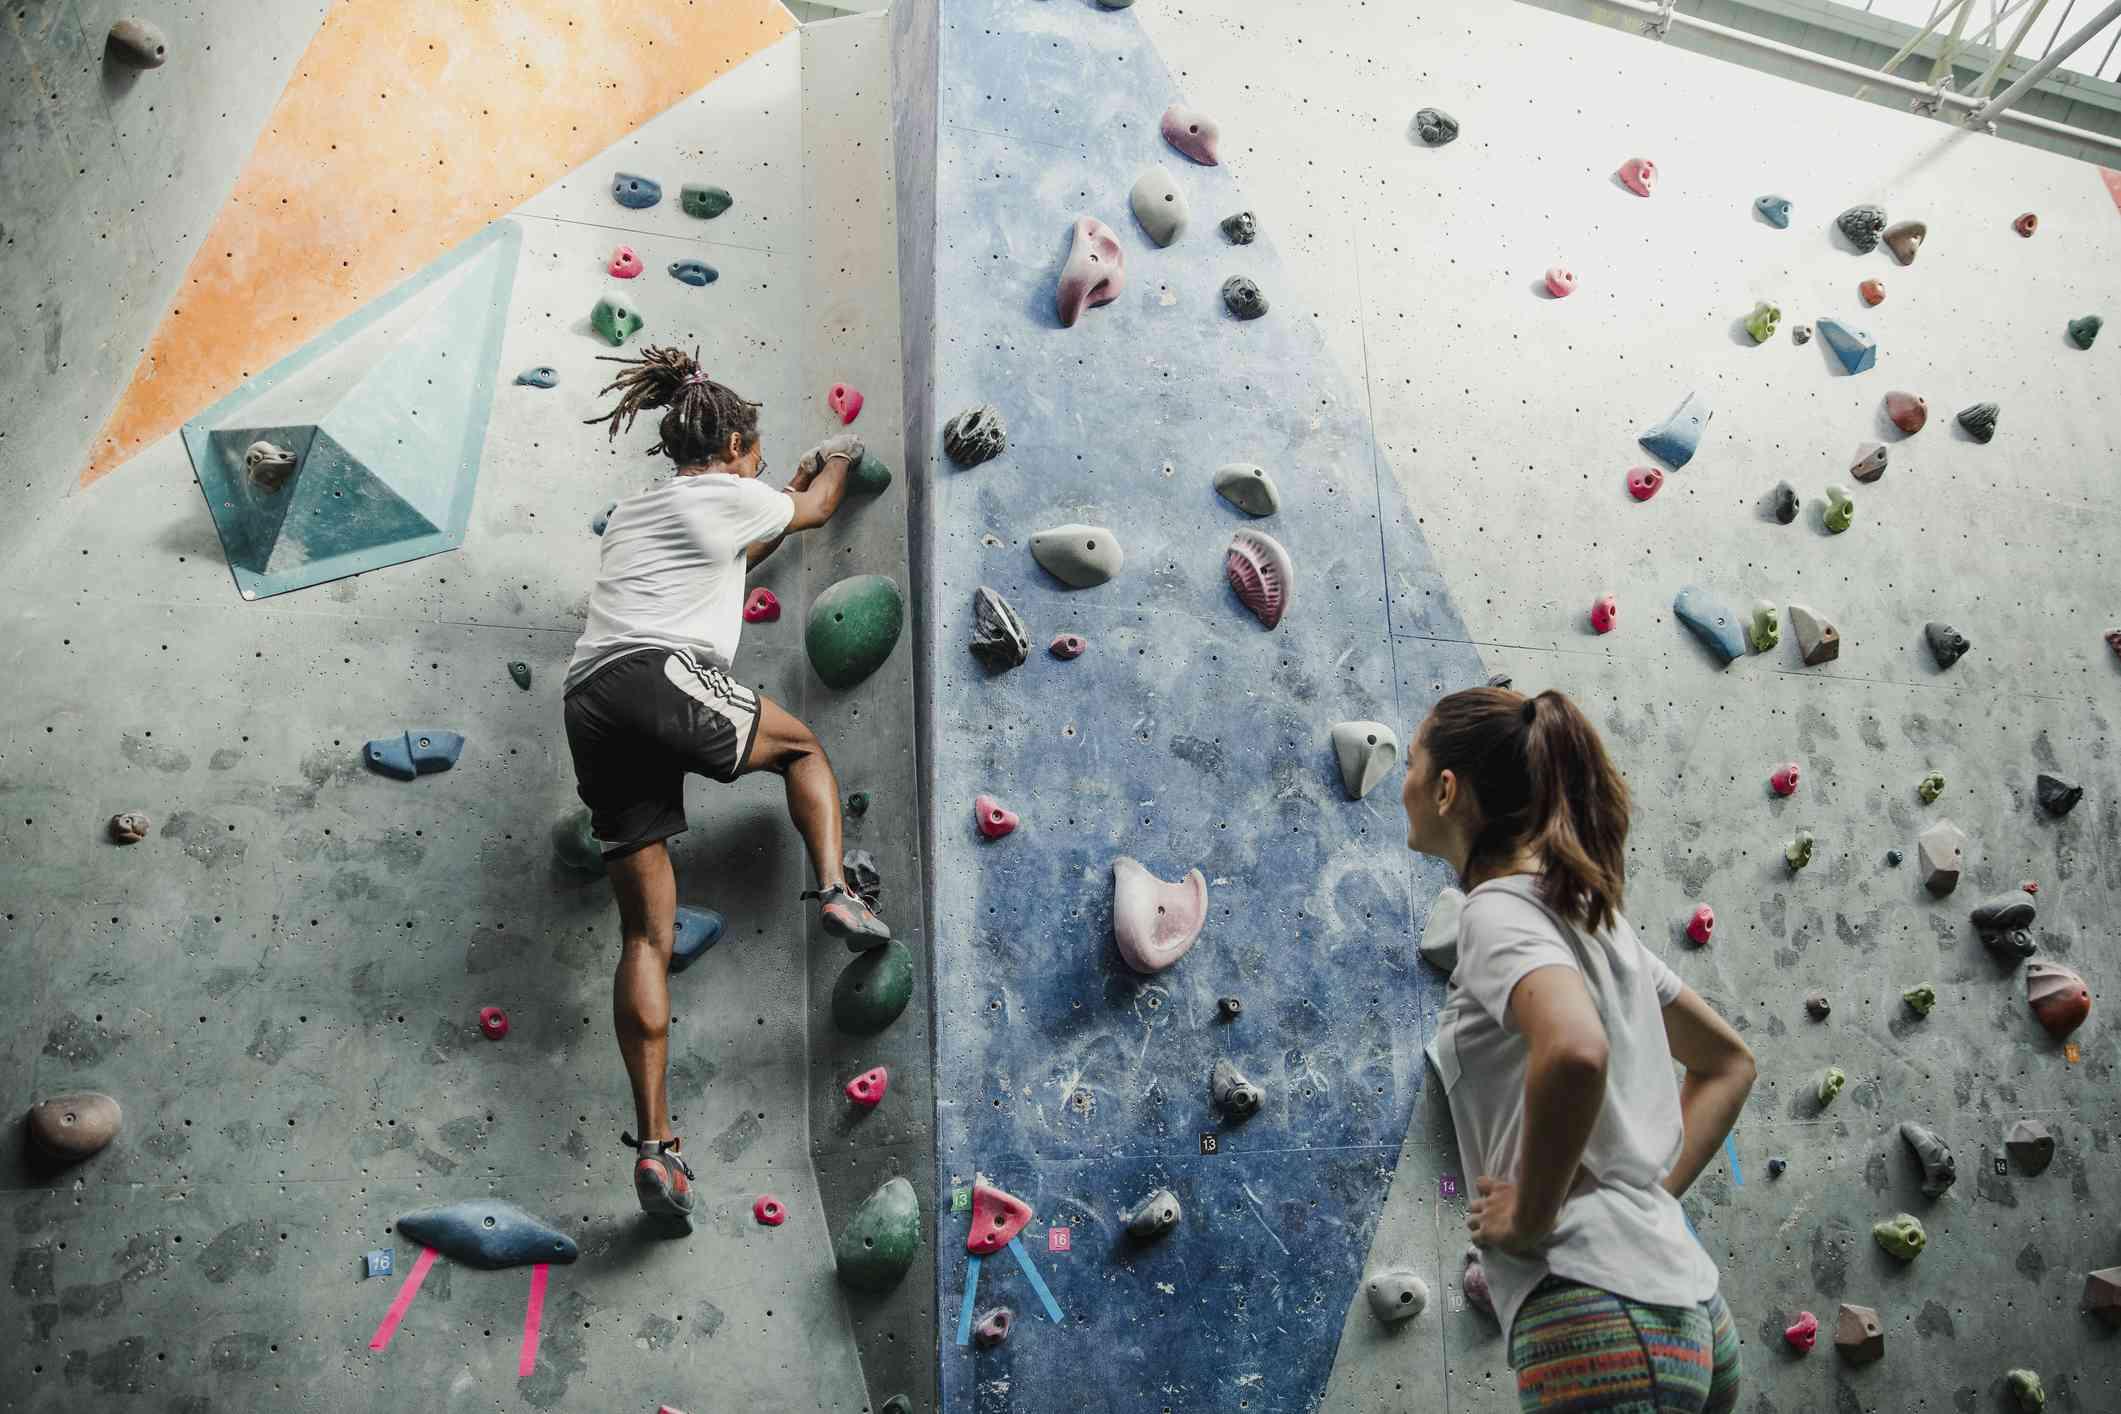 Girl watching her friend rock climb indoors